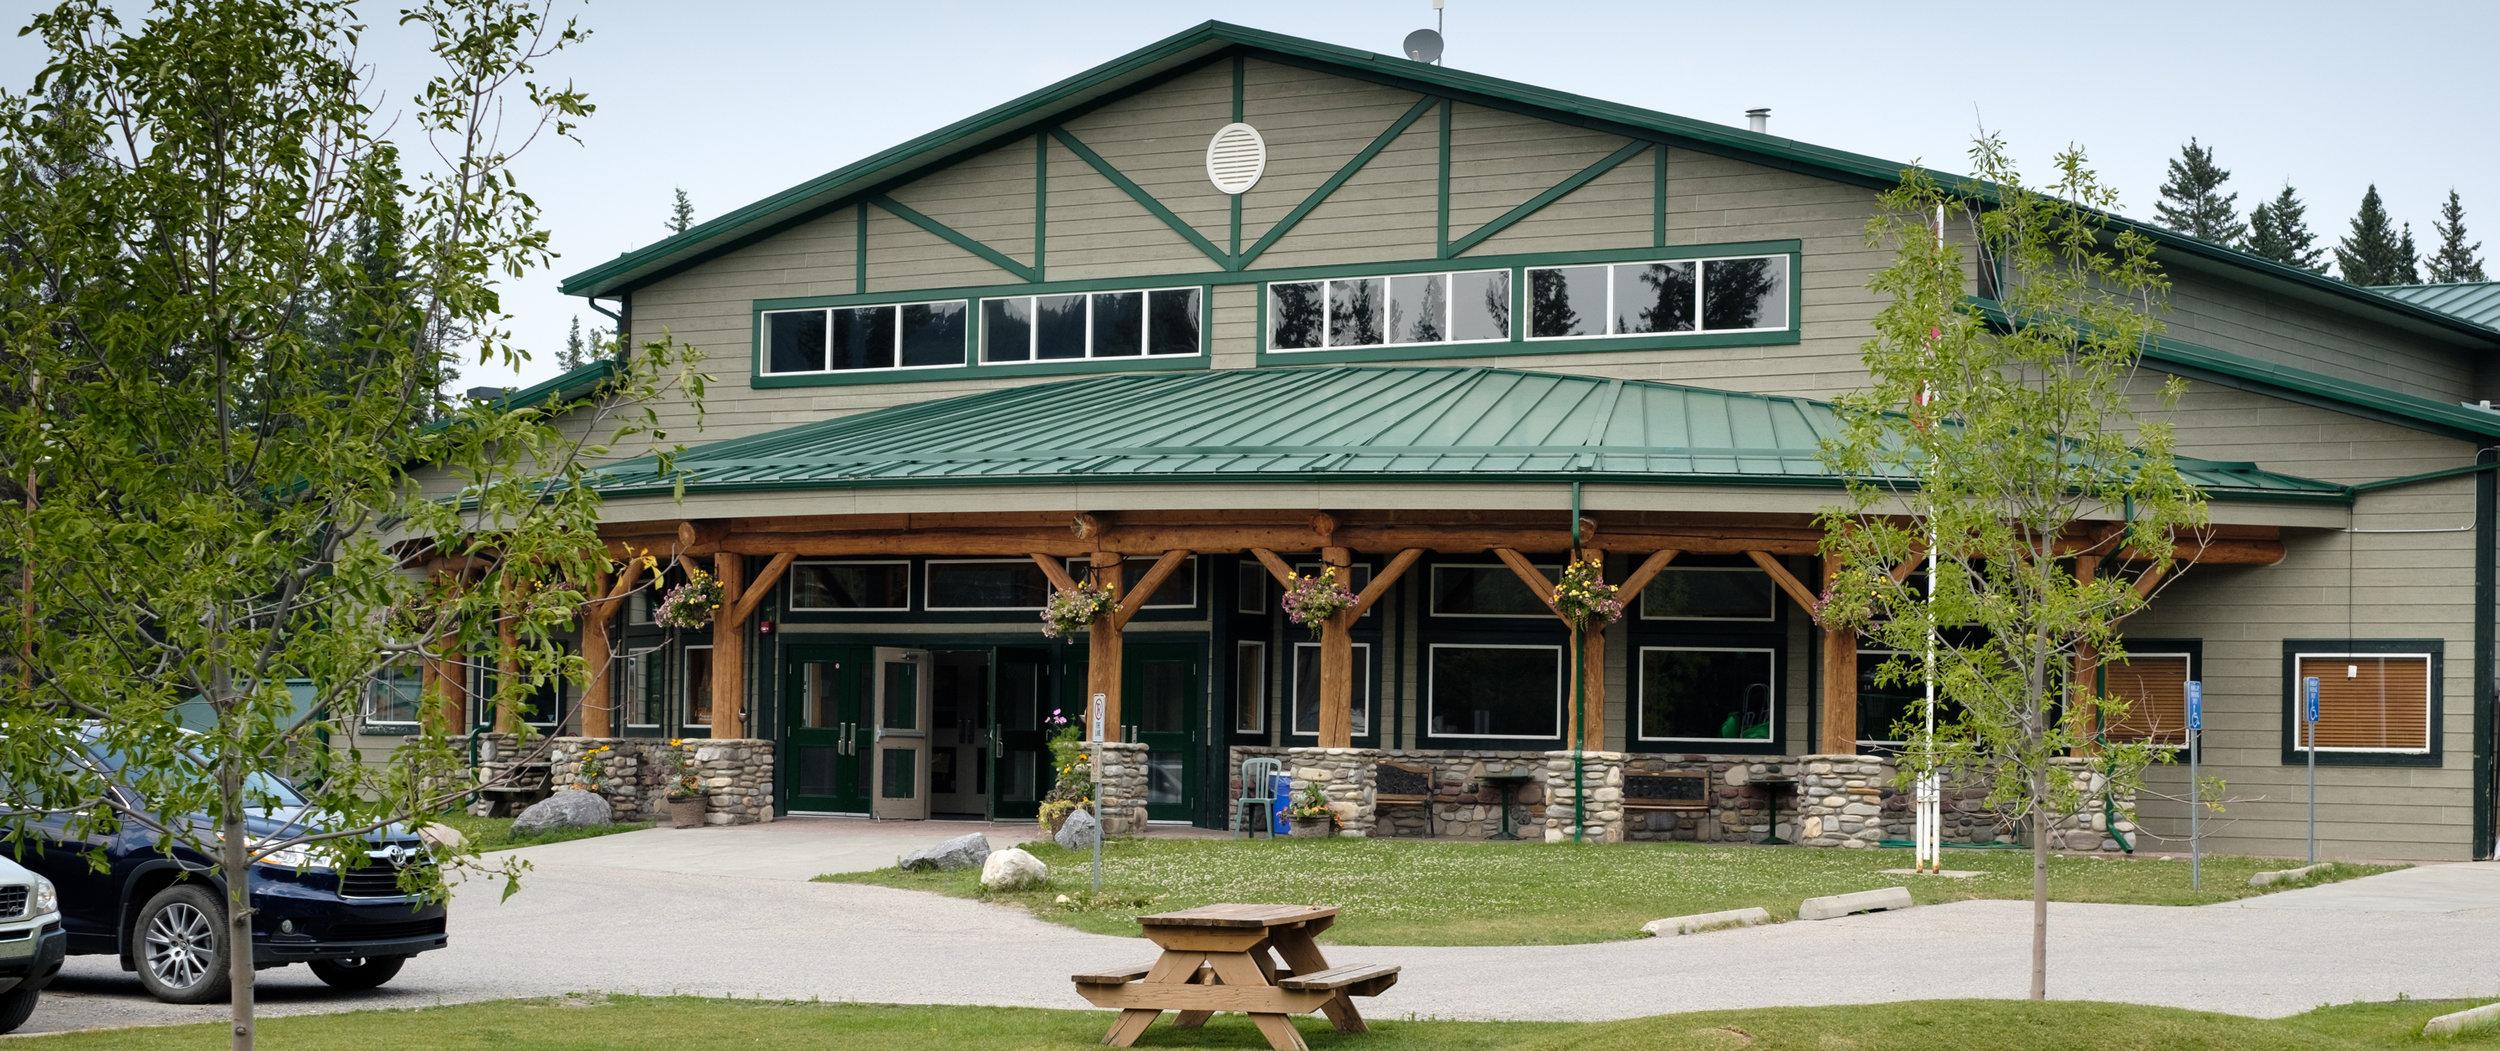 bragg creek community centre dance.jpg